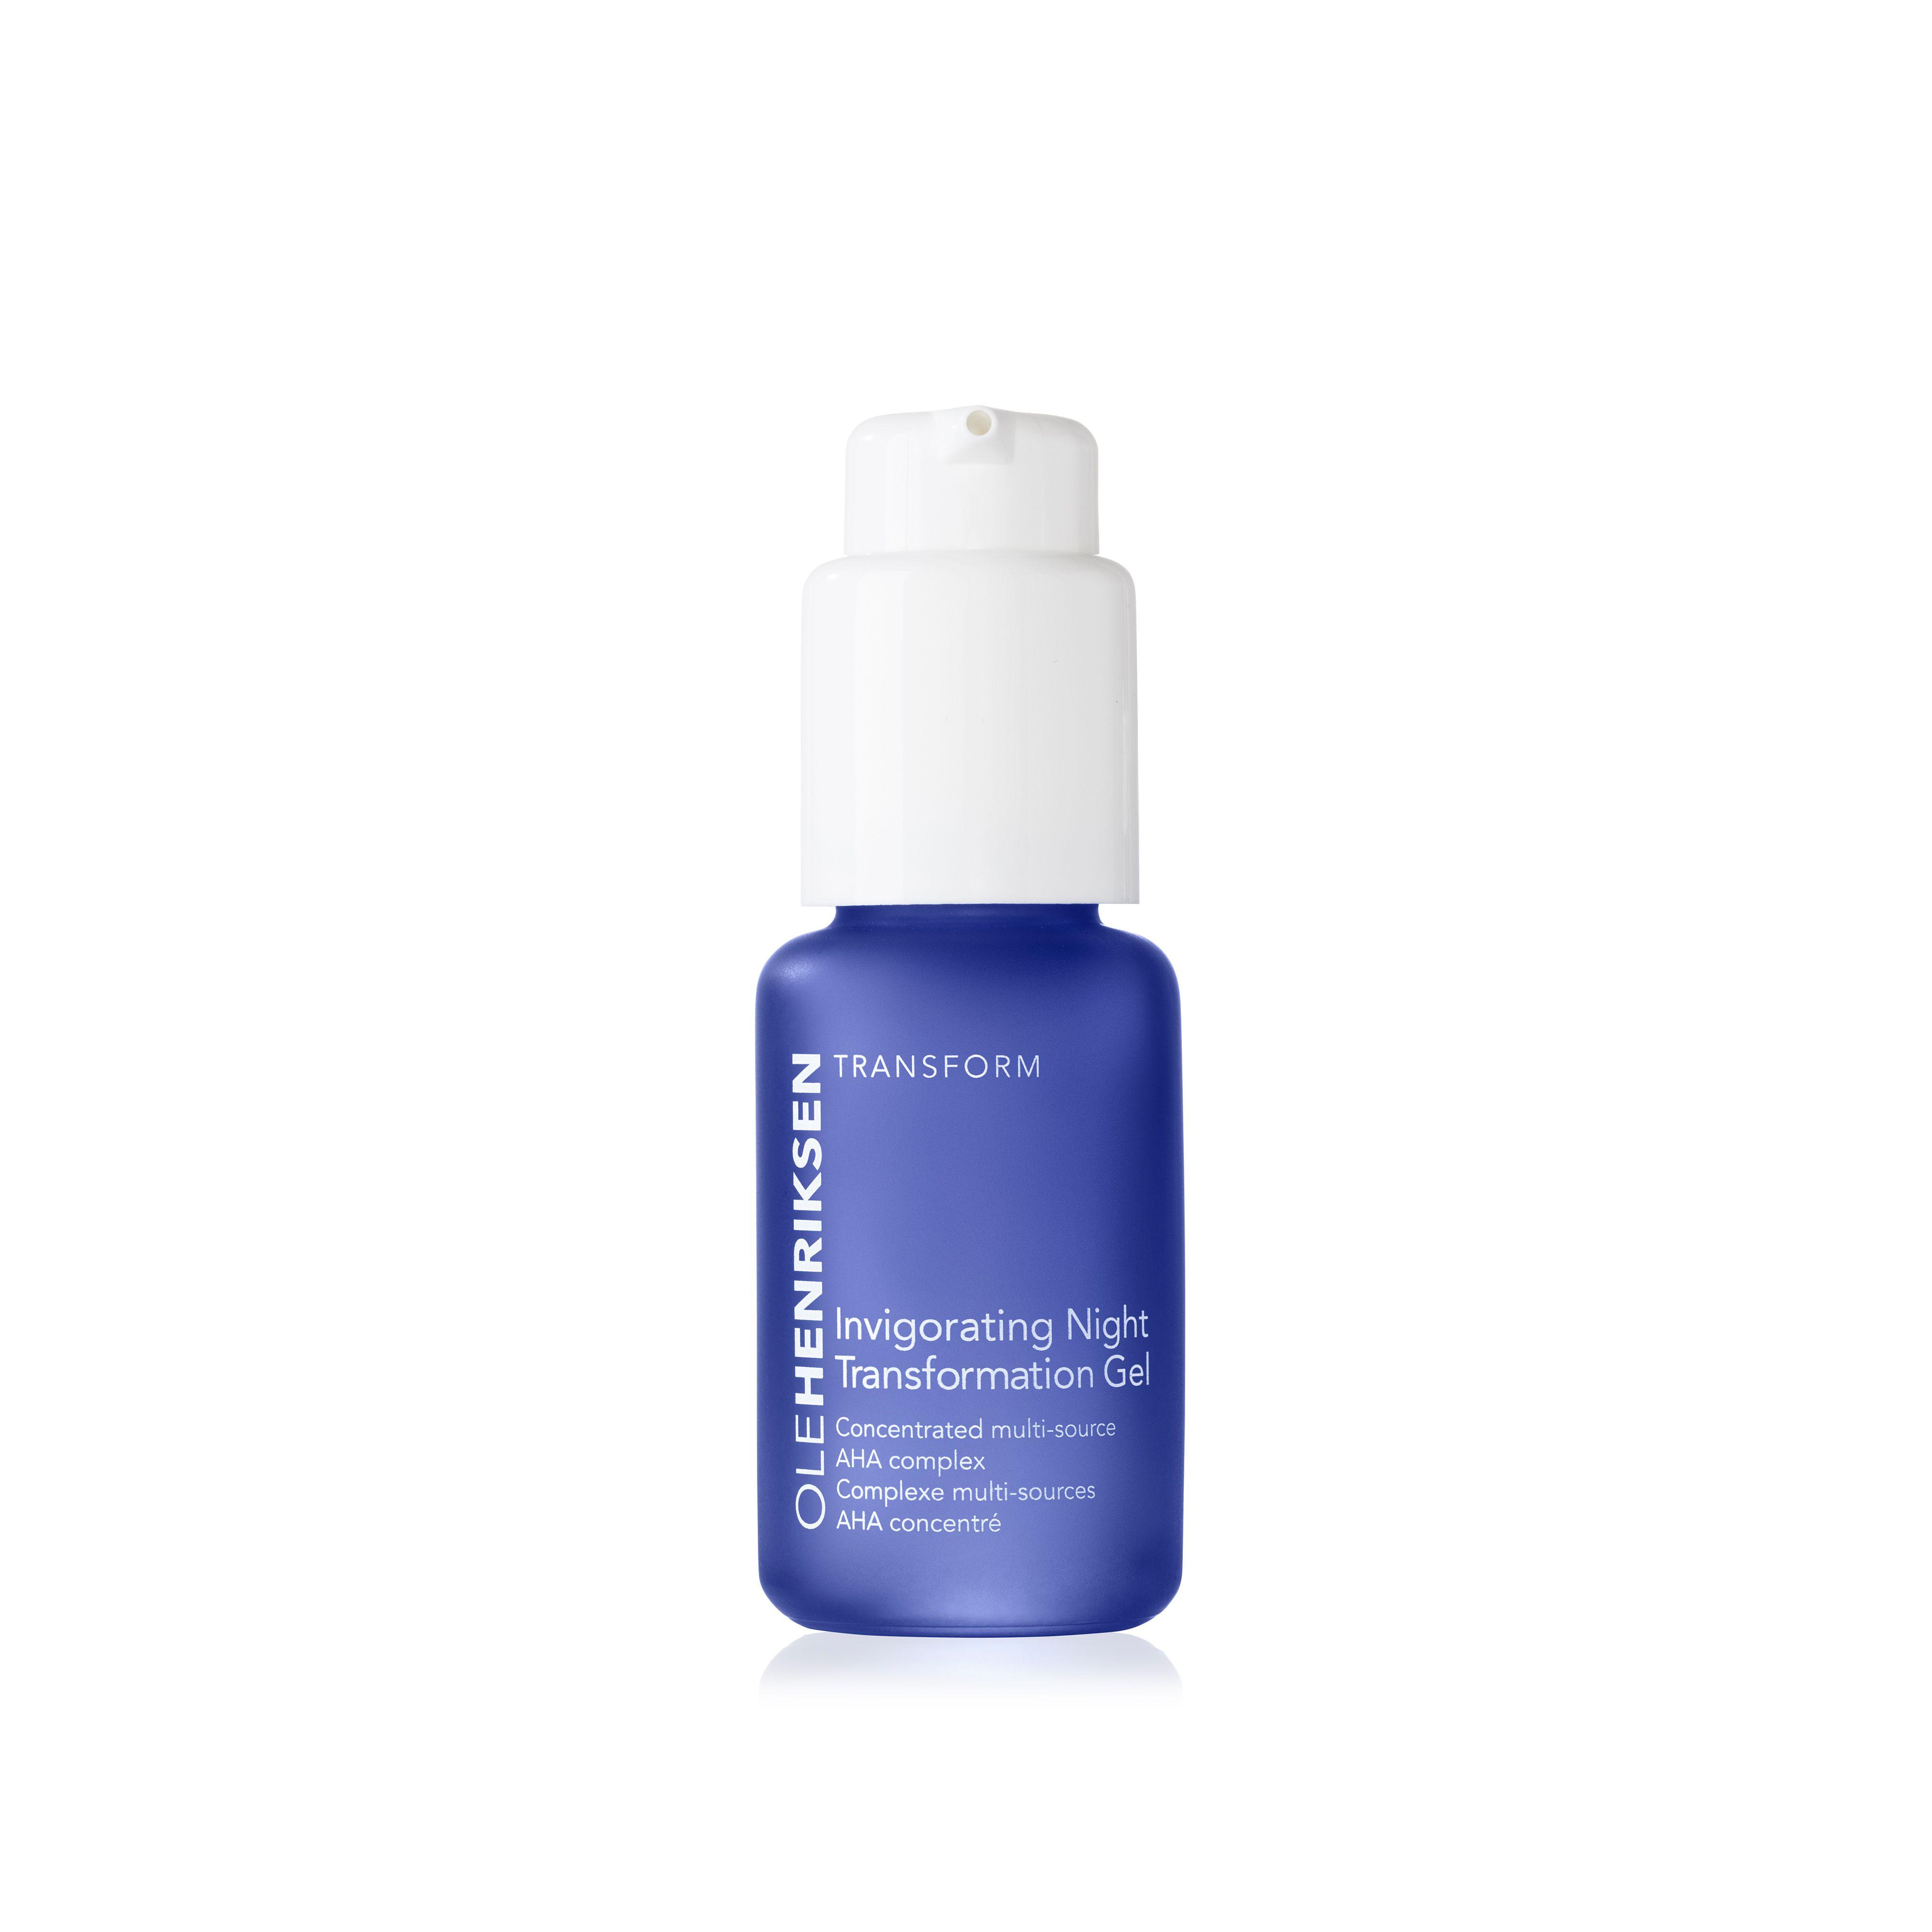 Ole Henriksen Transform Invigorating Night Transformation Gel, 30 ml